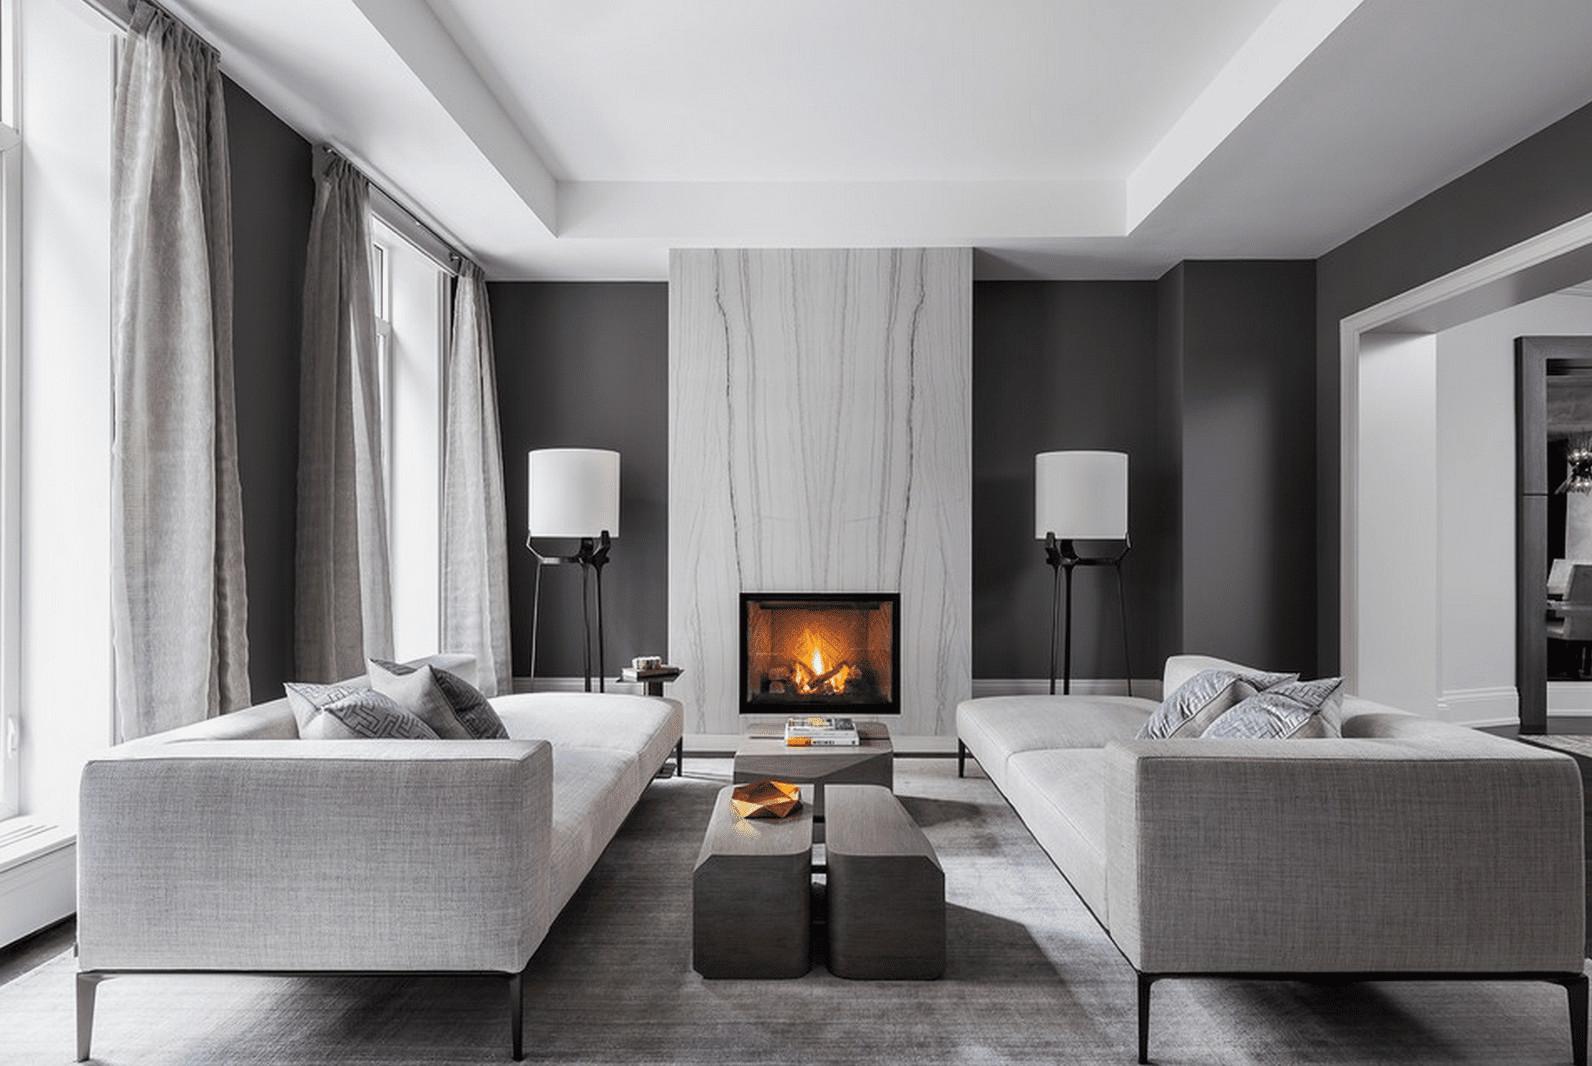 Modern Living Room Decor Ideas Luxury 21 Modern Living Room Design Ideas